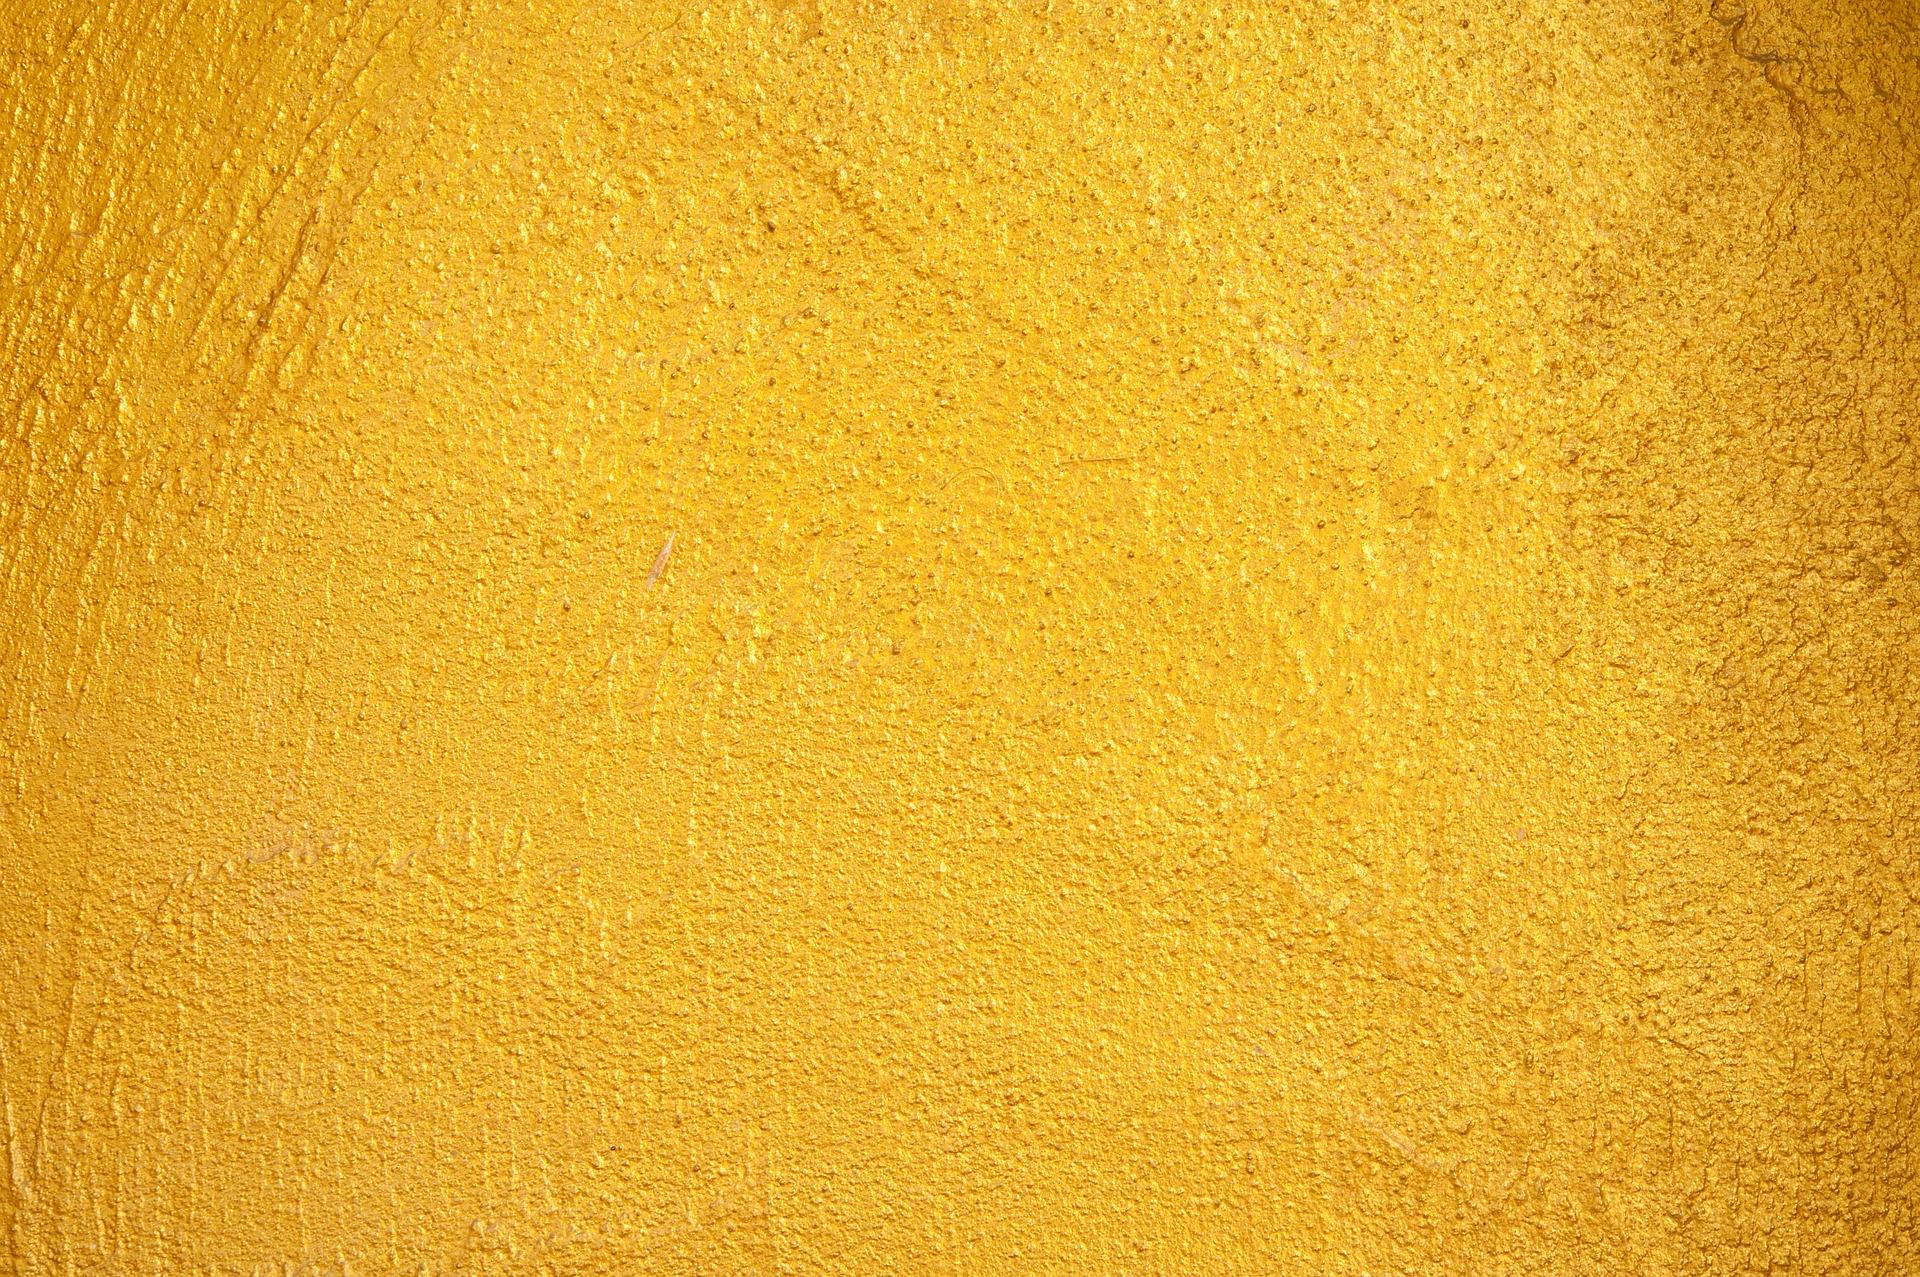 zolfo e acido salicilico unguento